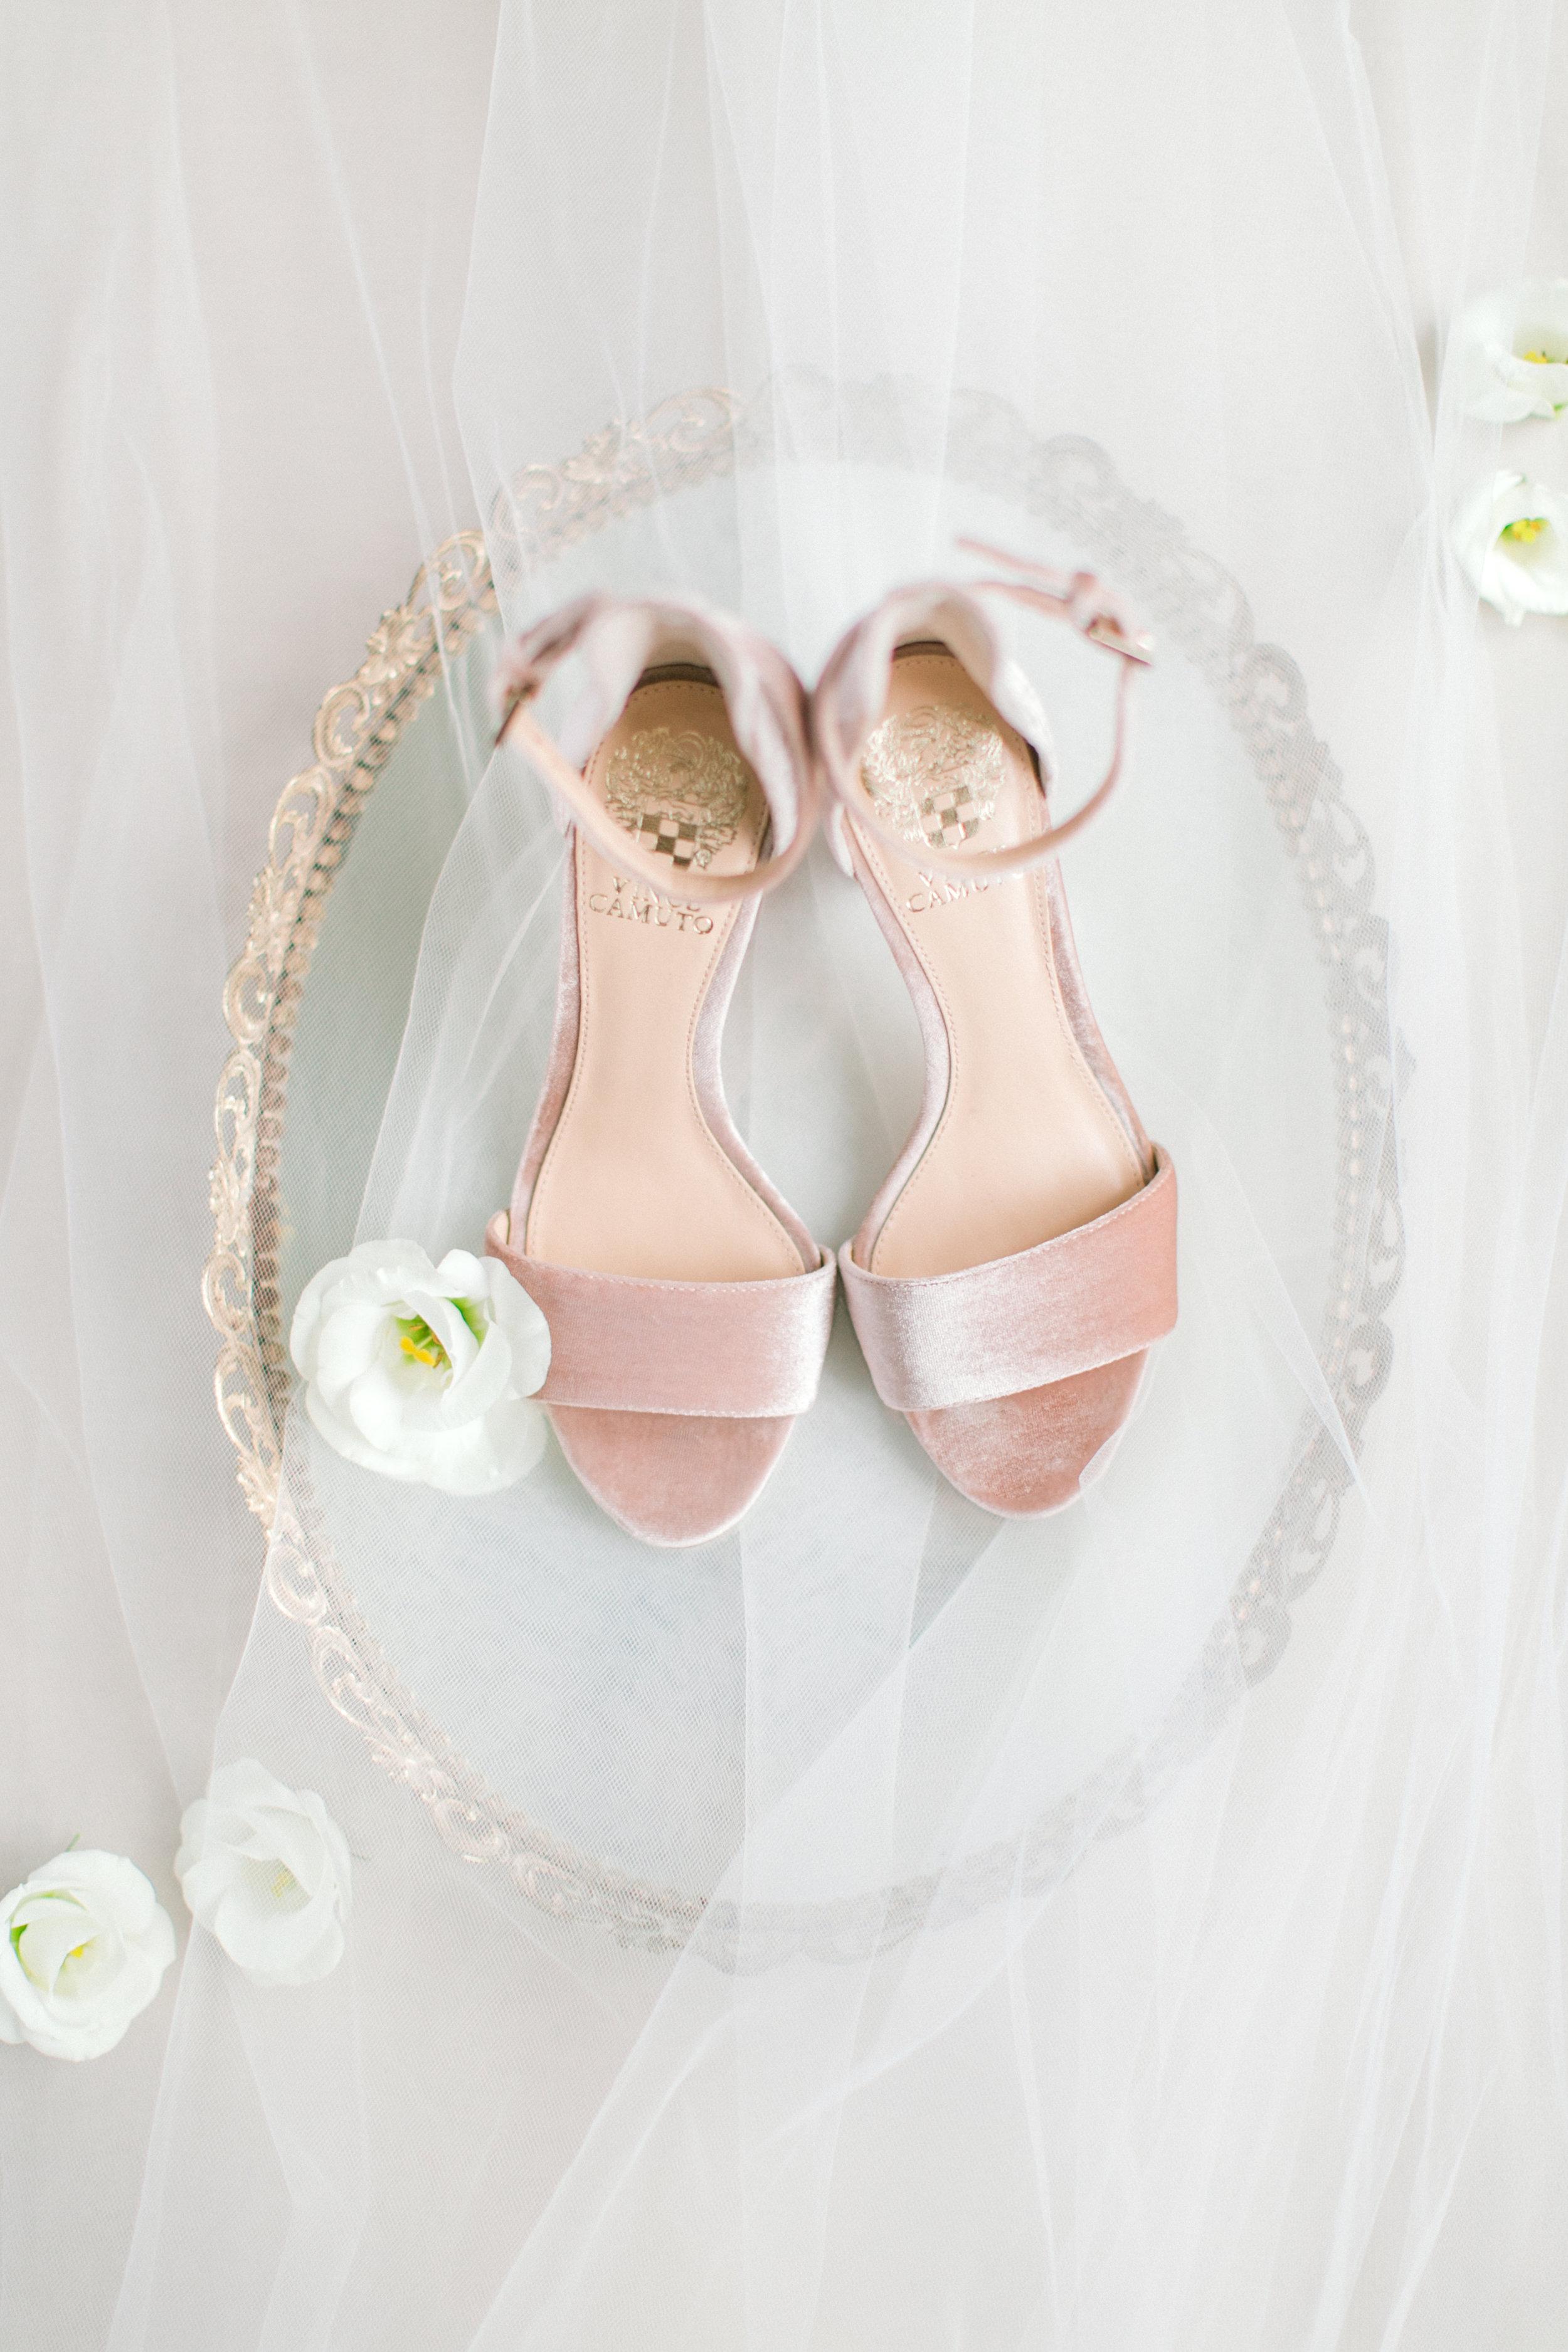 kurtz-wedding-toronto-photographer-langdon-film-richelle-hunter-anna-rob-previews-1.jpg